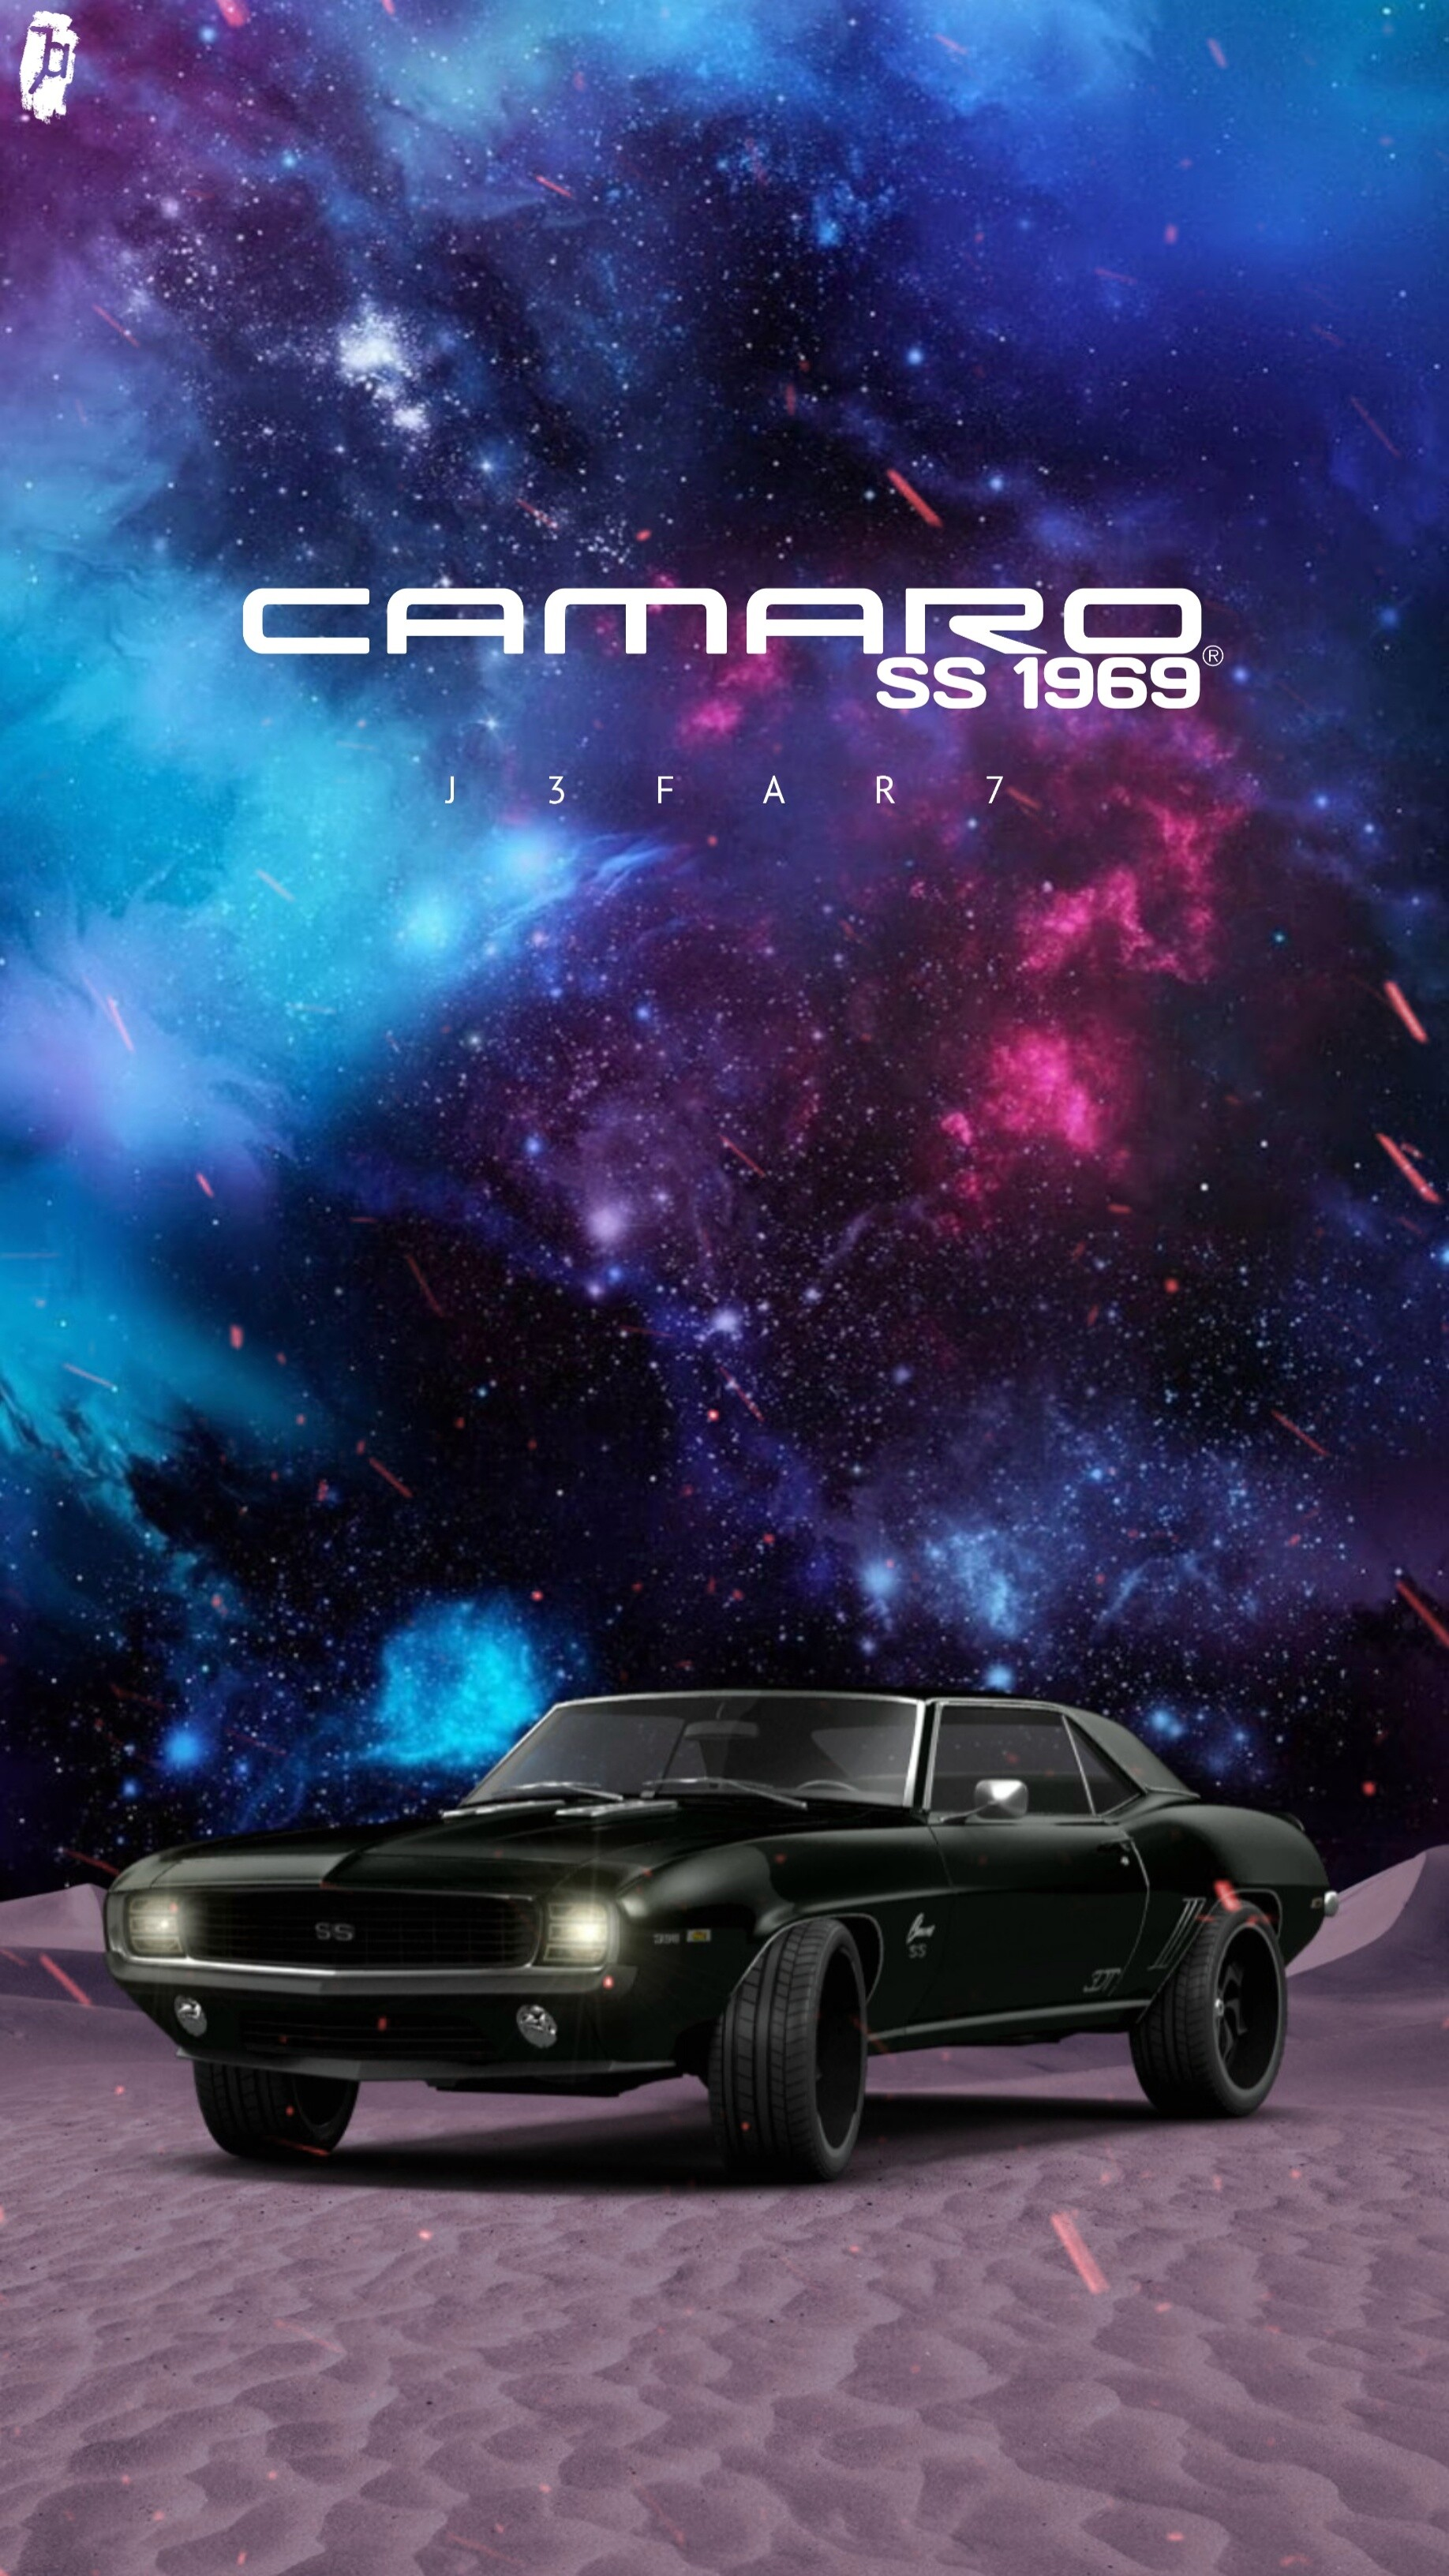 Camaro 69 Wallpaper